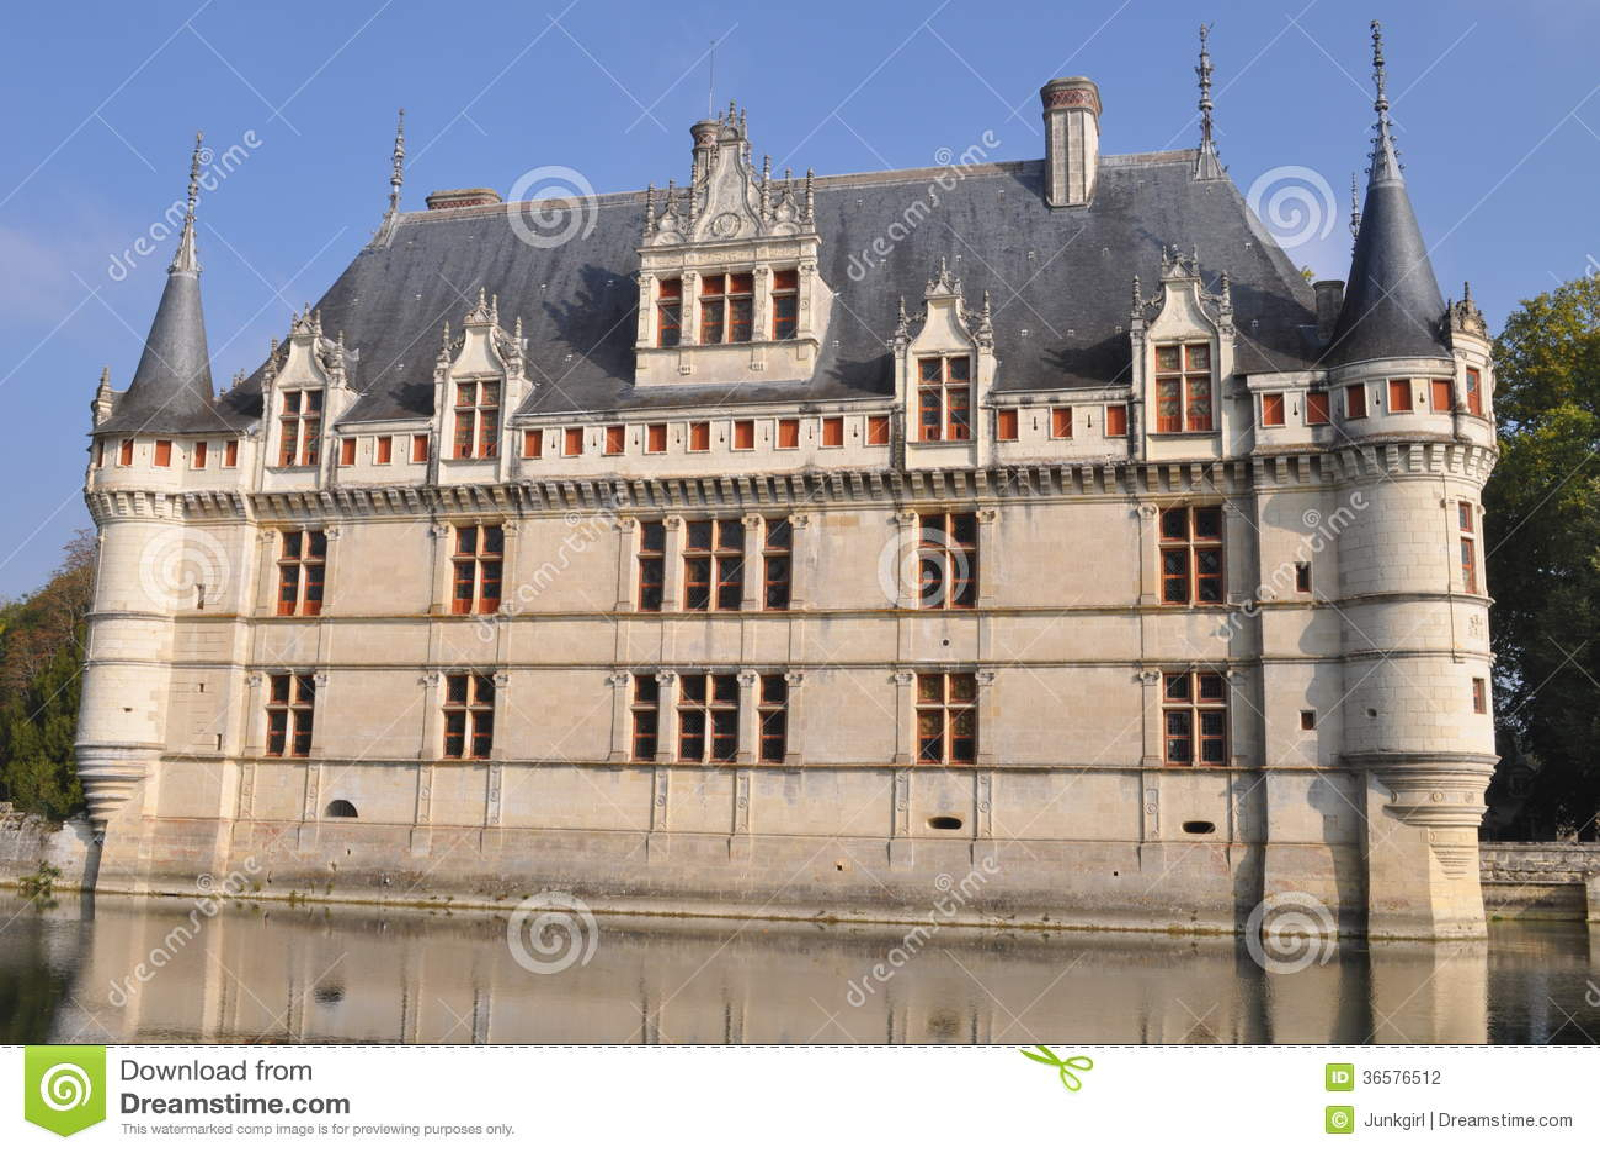 chateau stock photography image 36576512